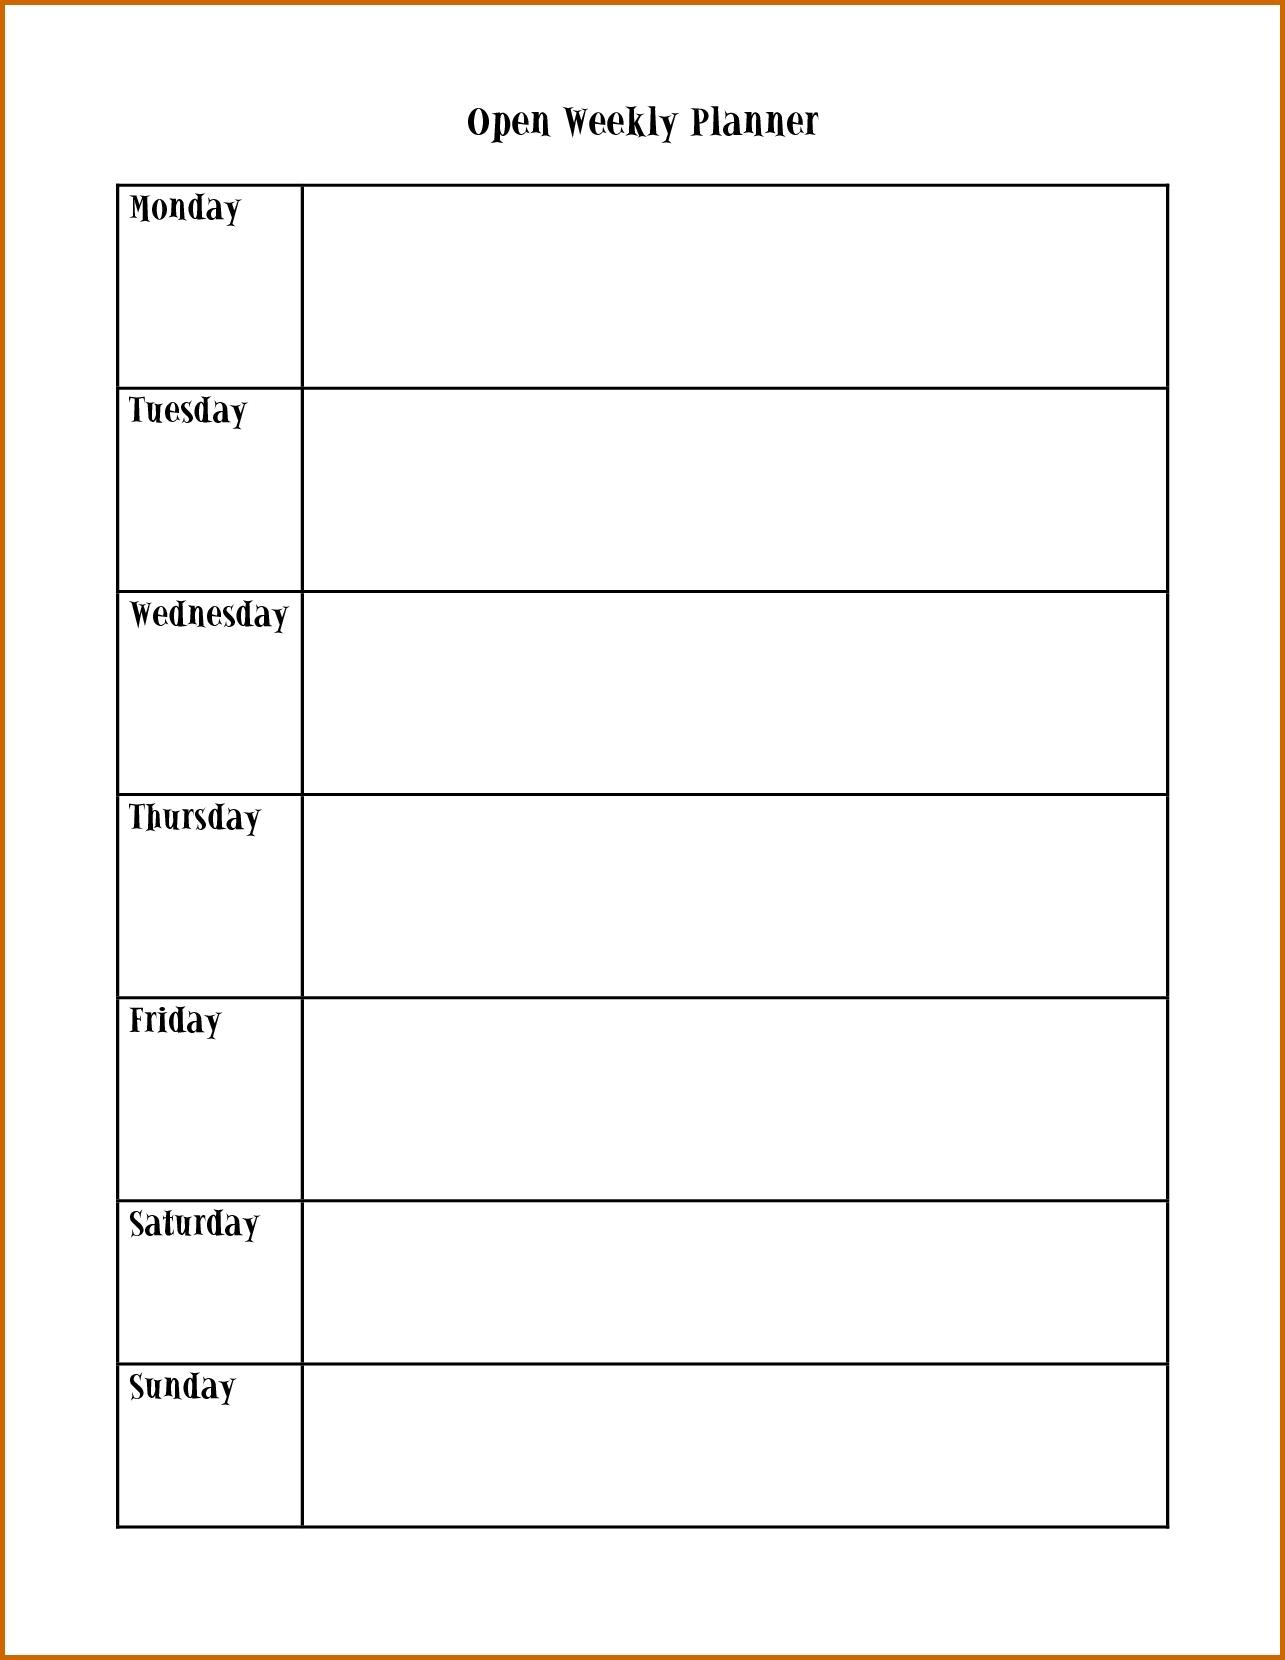 21 Images Of Monday Through Friday Calendar Template 2016-Calendar Template Monday Through Friday